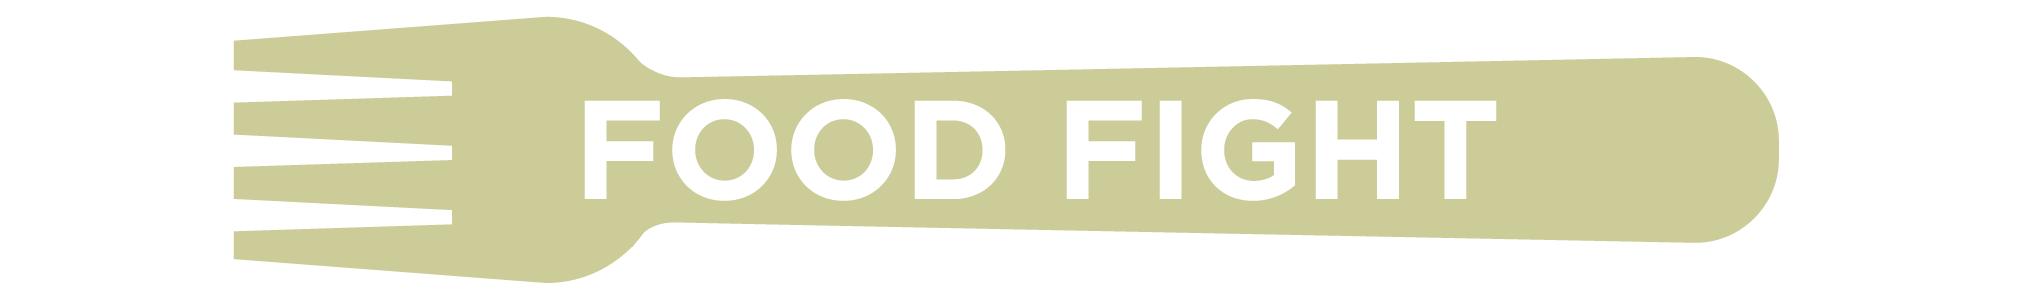 Frisco-2-Identity_CornyDogs-FoodFight.png